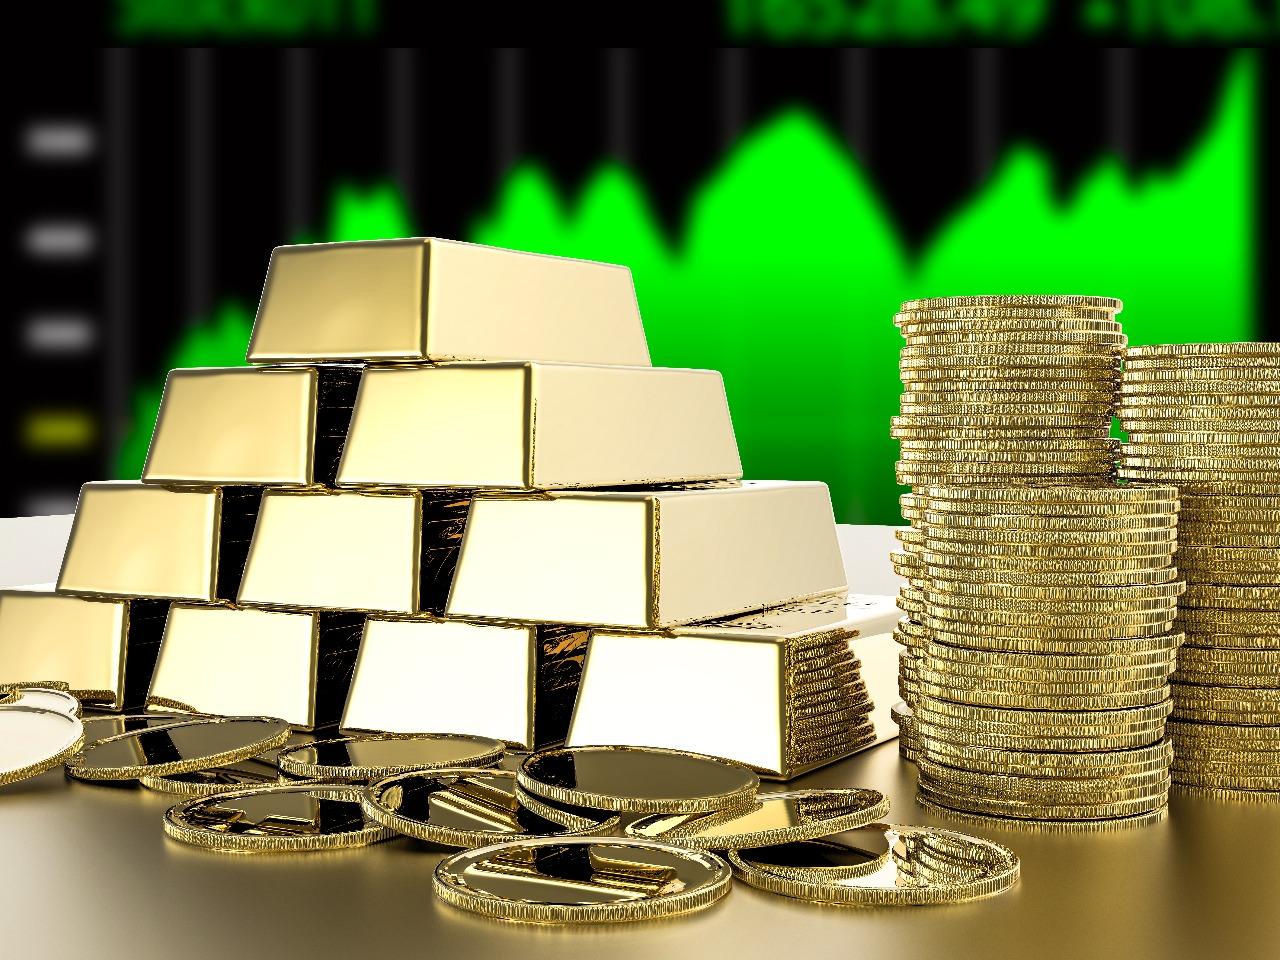 https: img.okeinfo.net content 2020 07 01 320 2239232 harga-emas-berjangka-tembus-level-tertinggi-sejak-2011-RyICPk02iP.jpg